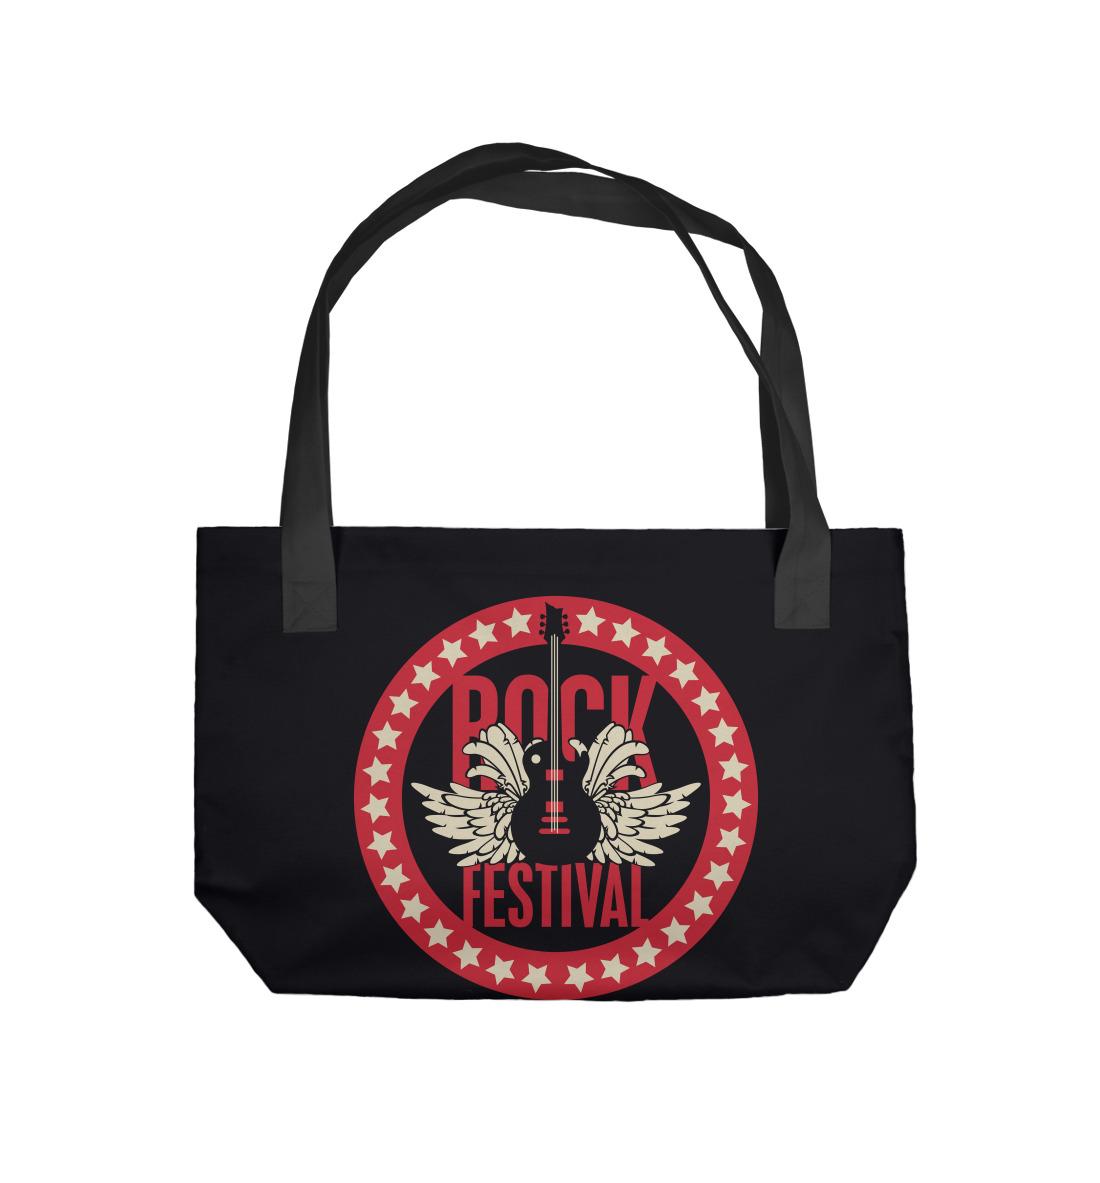 Фото - Рок-фестиваль 1985 фестиваль 5612 5616кб квартблоки серия